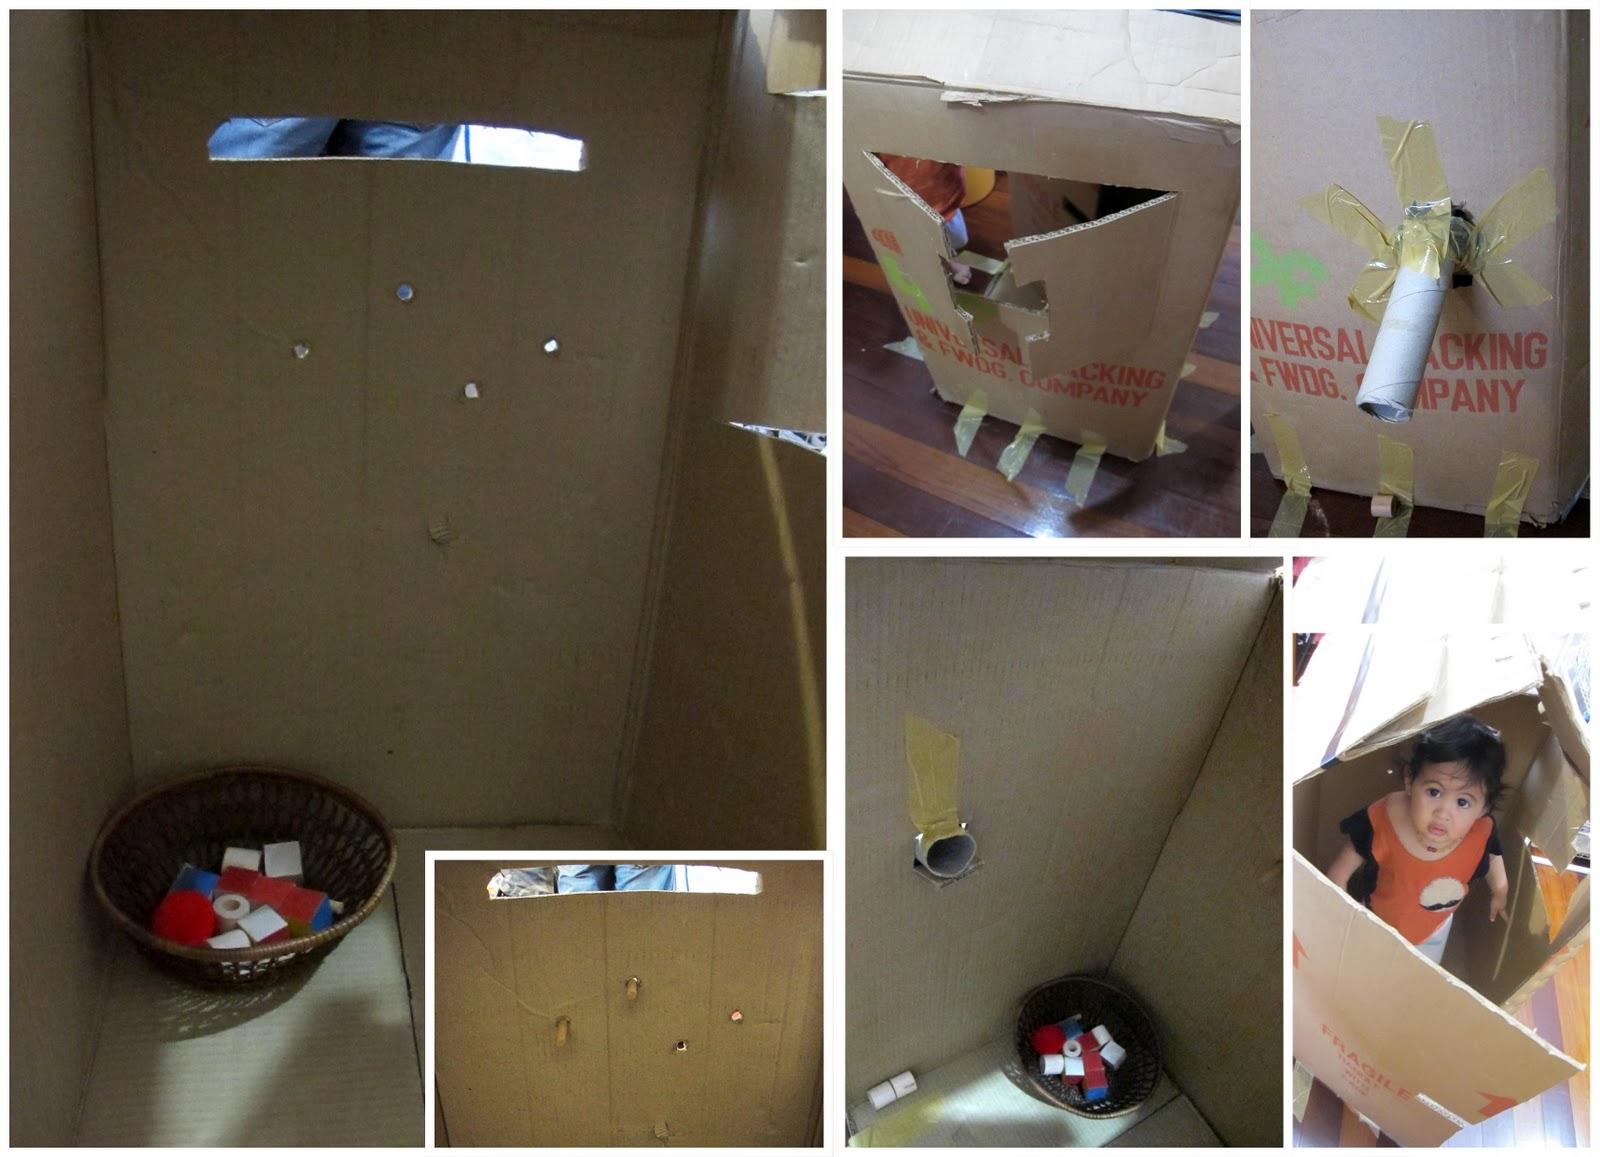 rabbit the penguin living in a cardboard box. Black Bedroom Furniture Sets. Home Design Ideas